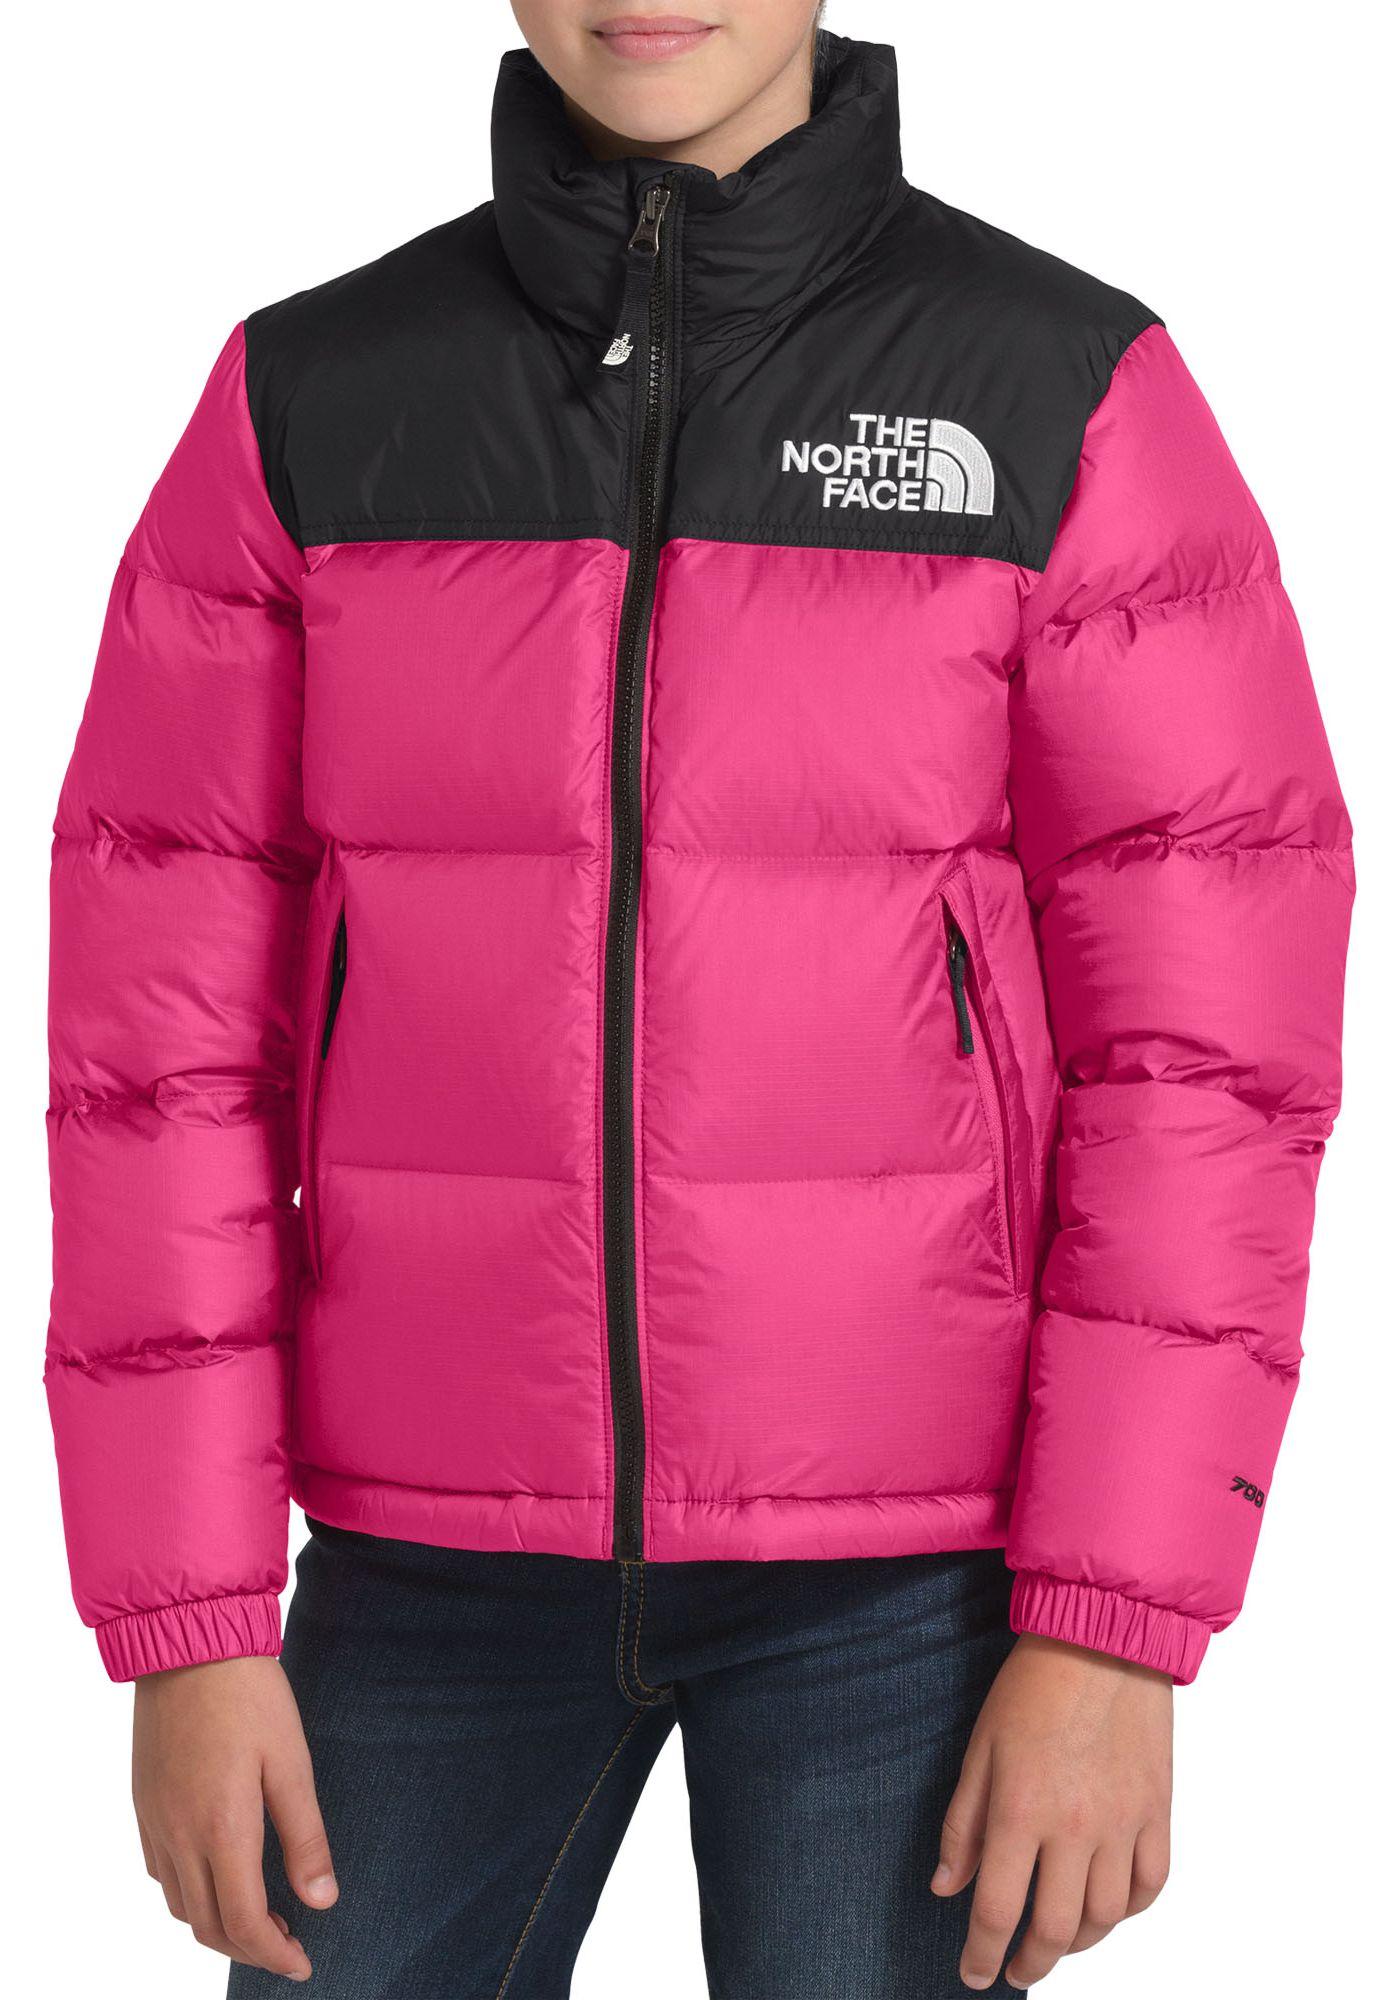 The North Face Youth 1996 Retro Nuptse Down Jacket